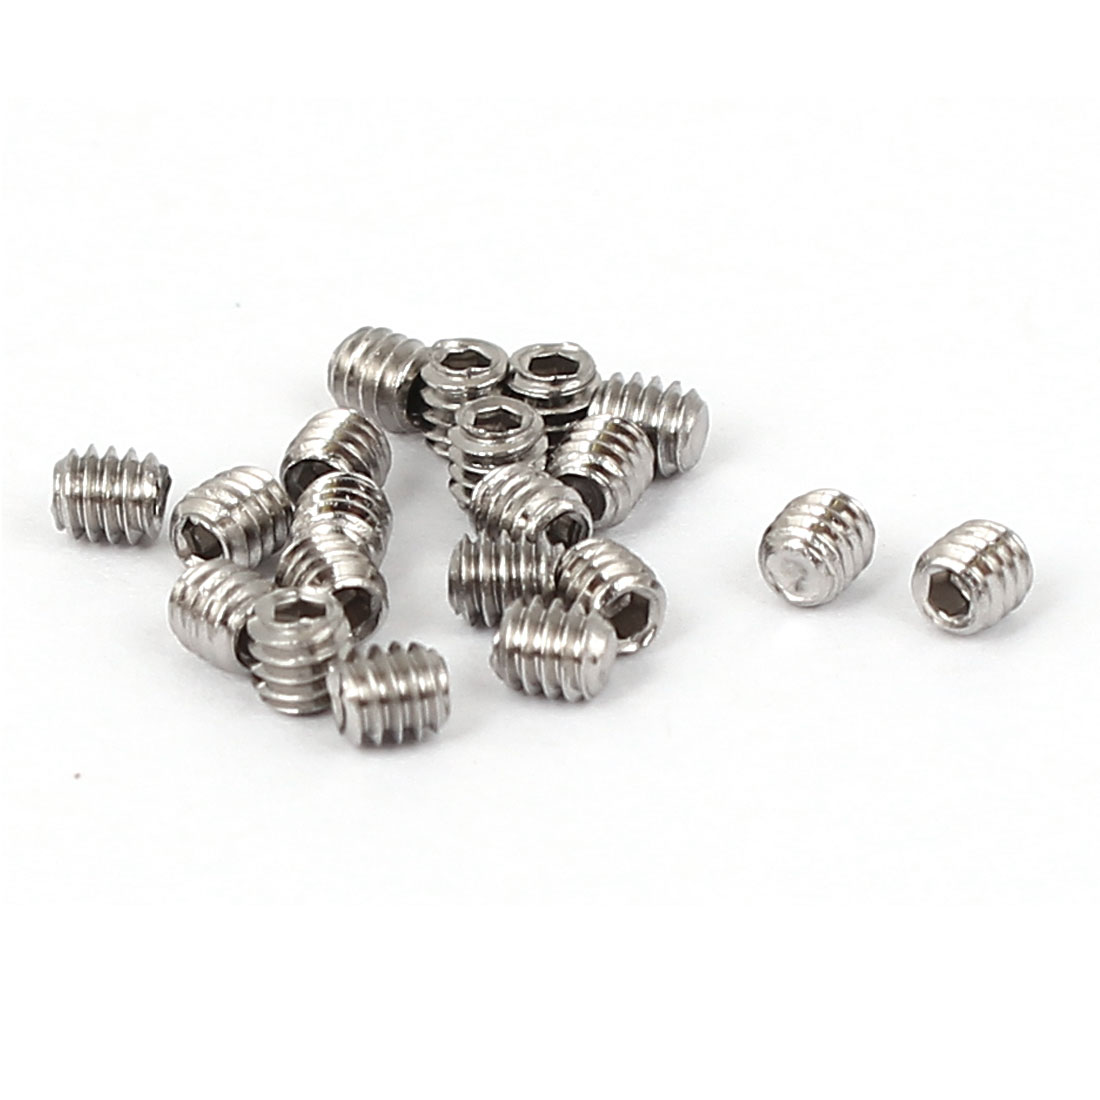 M2x2mm Cup Point Hex Socket Grub Set Screws 20pcs for Gear